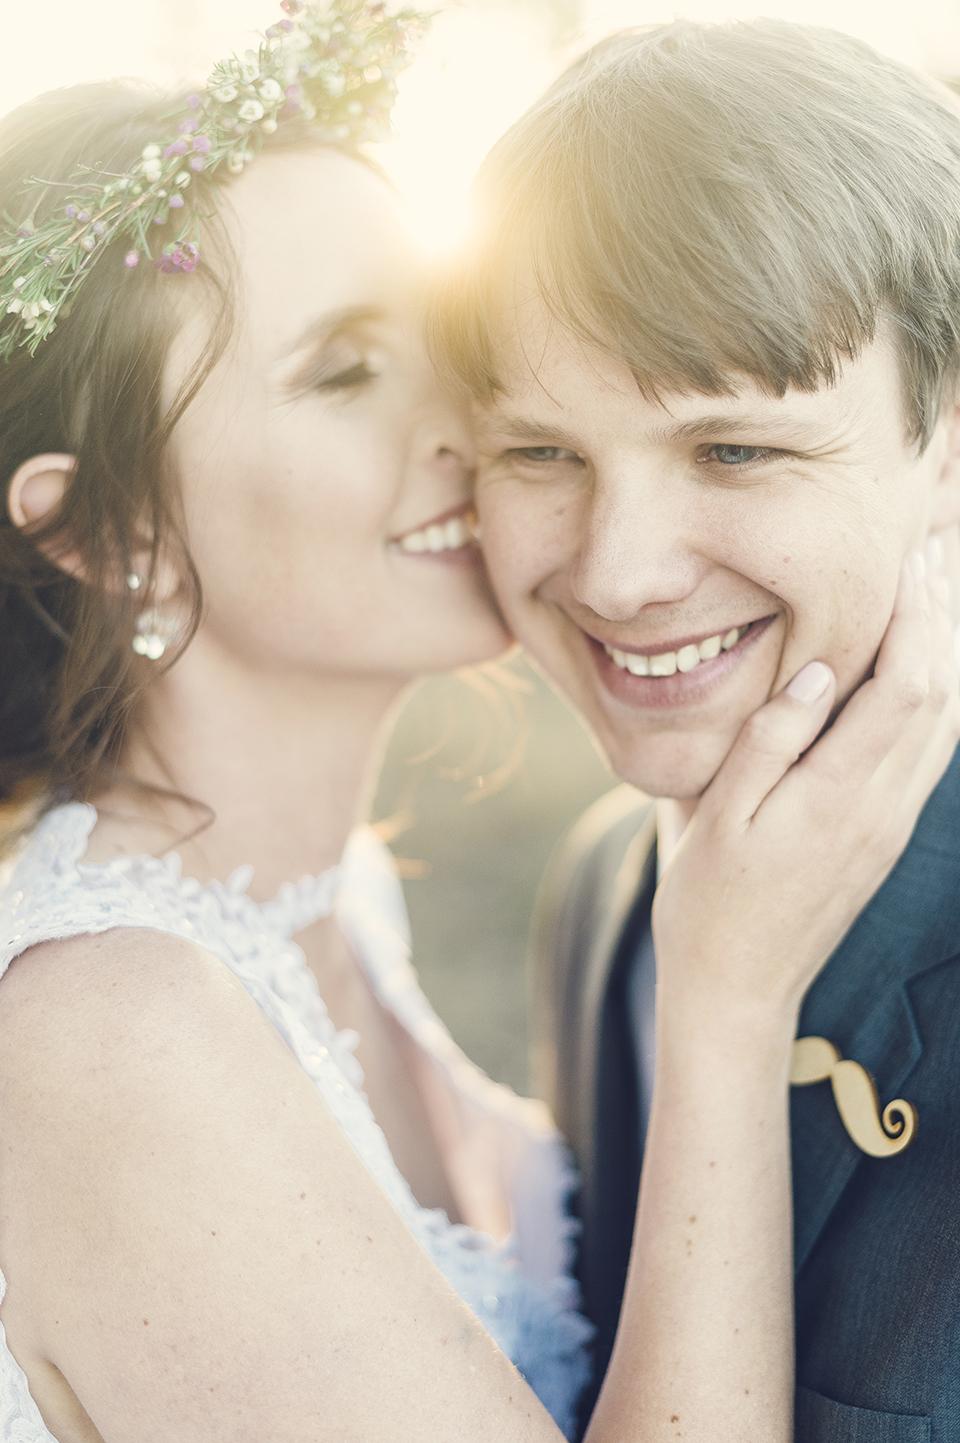 RyanParker_WeddingPhotographer_Pretoria_RosemaryHill_Gauteng_P&R_DSC_6961.jpg